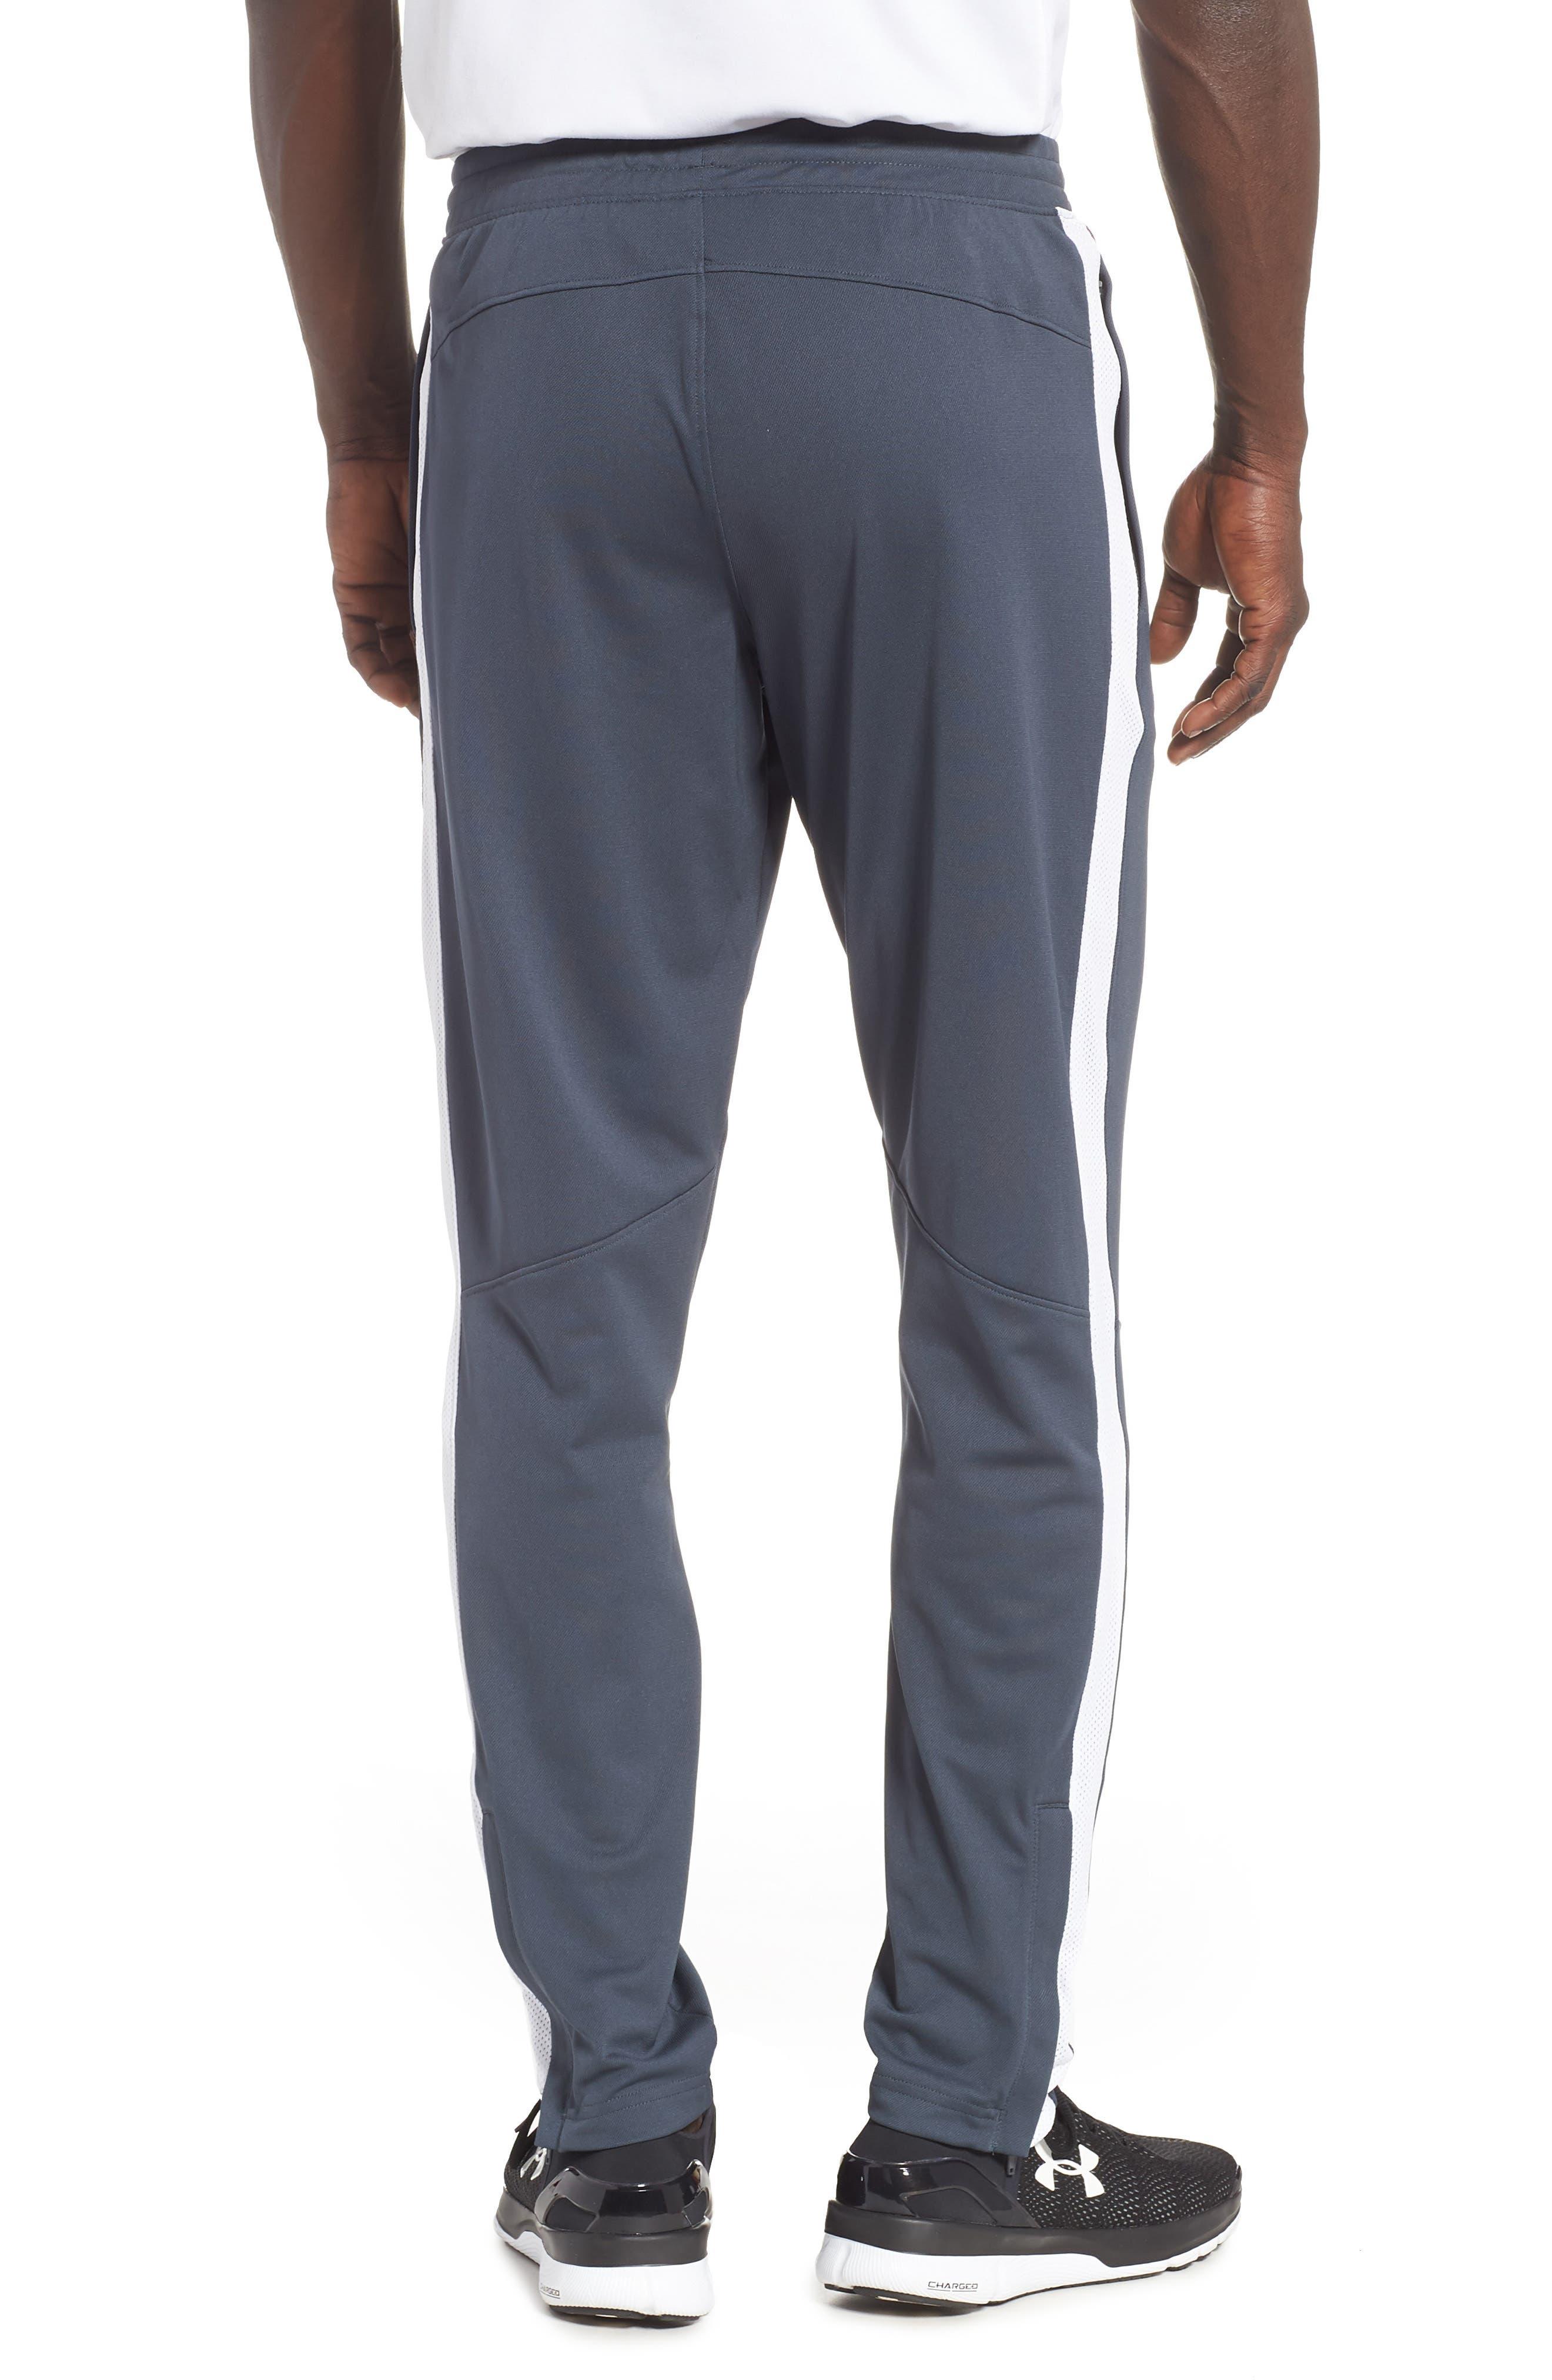 Sportstyle Slim Piqué Track Pants,                             Alternate thumbnail 2, color,                             STEALTH GRAY / / WHITE